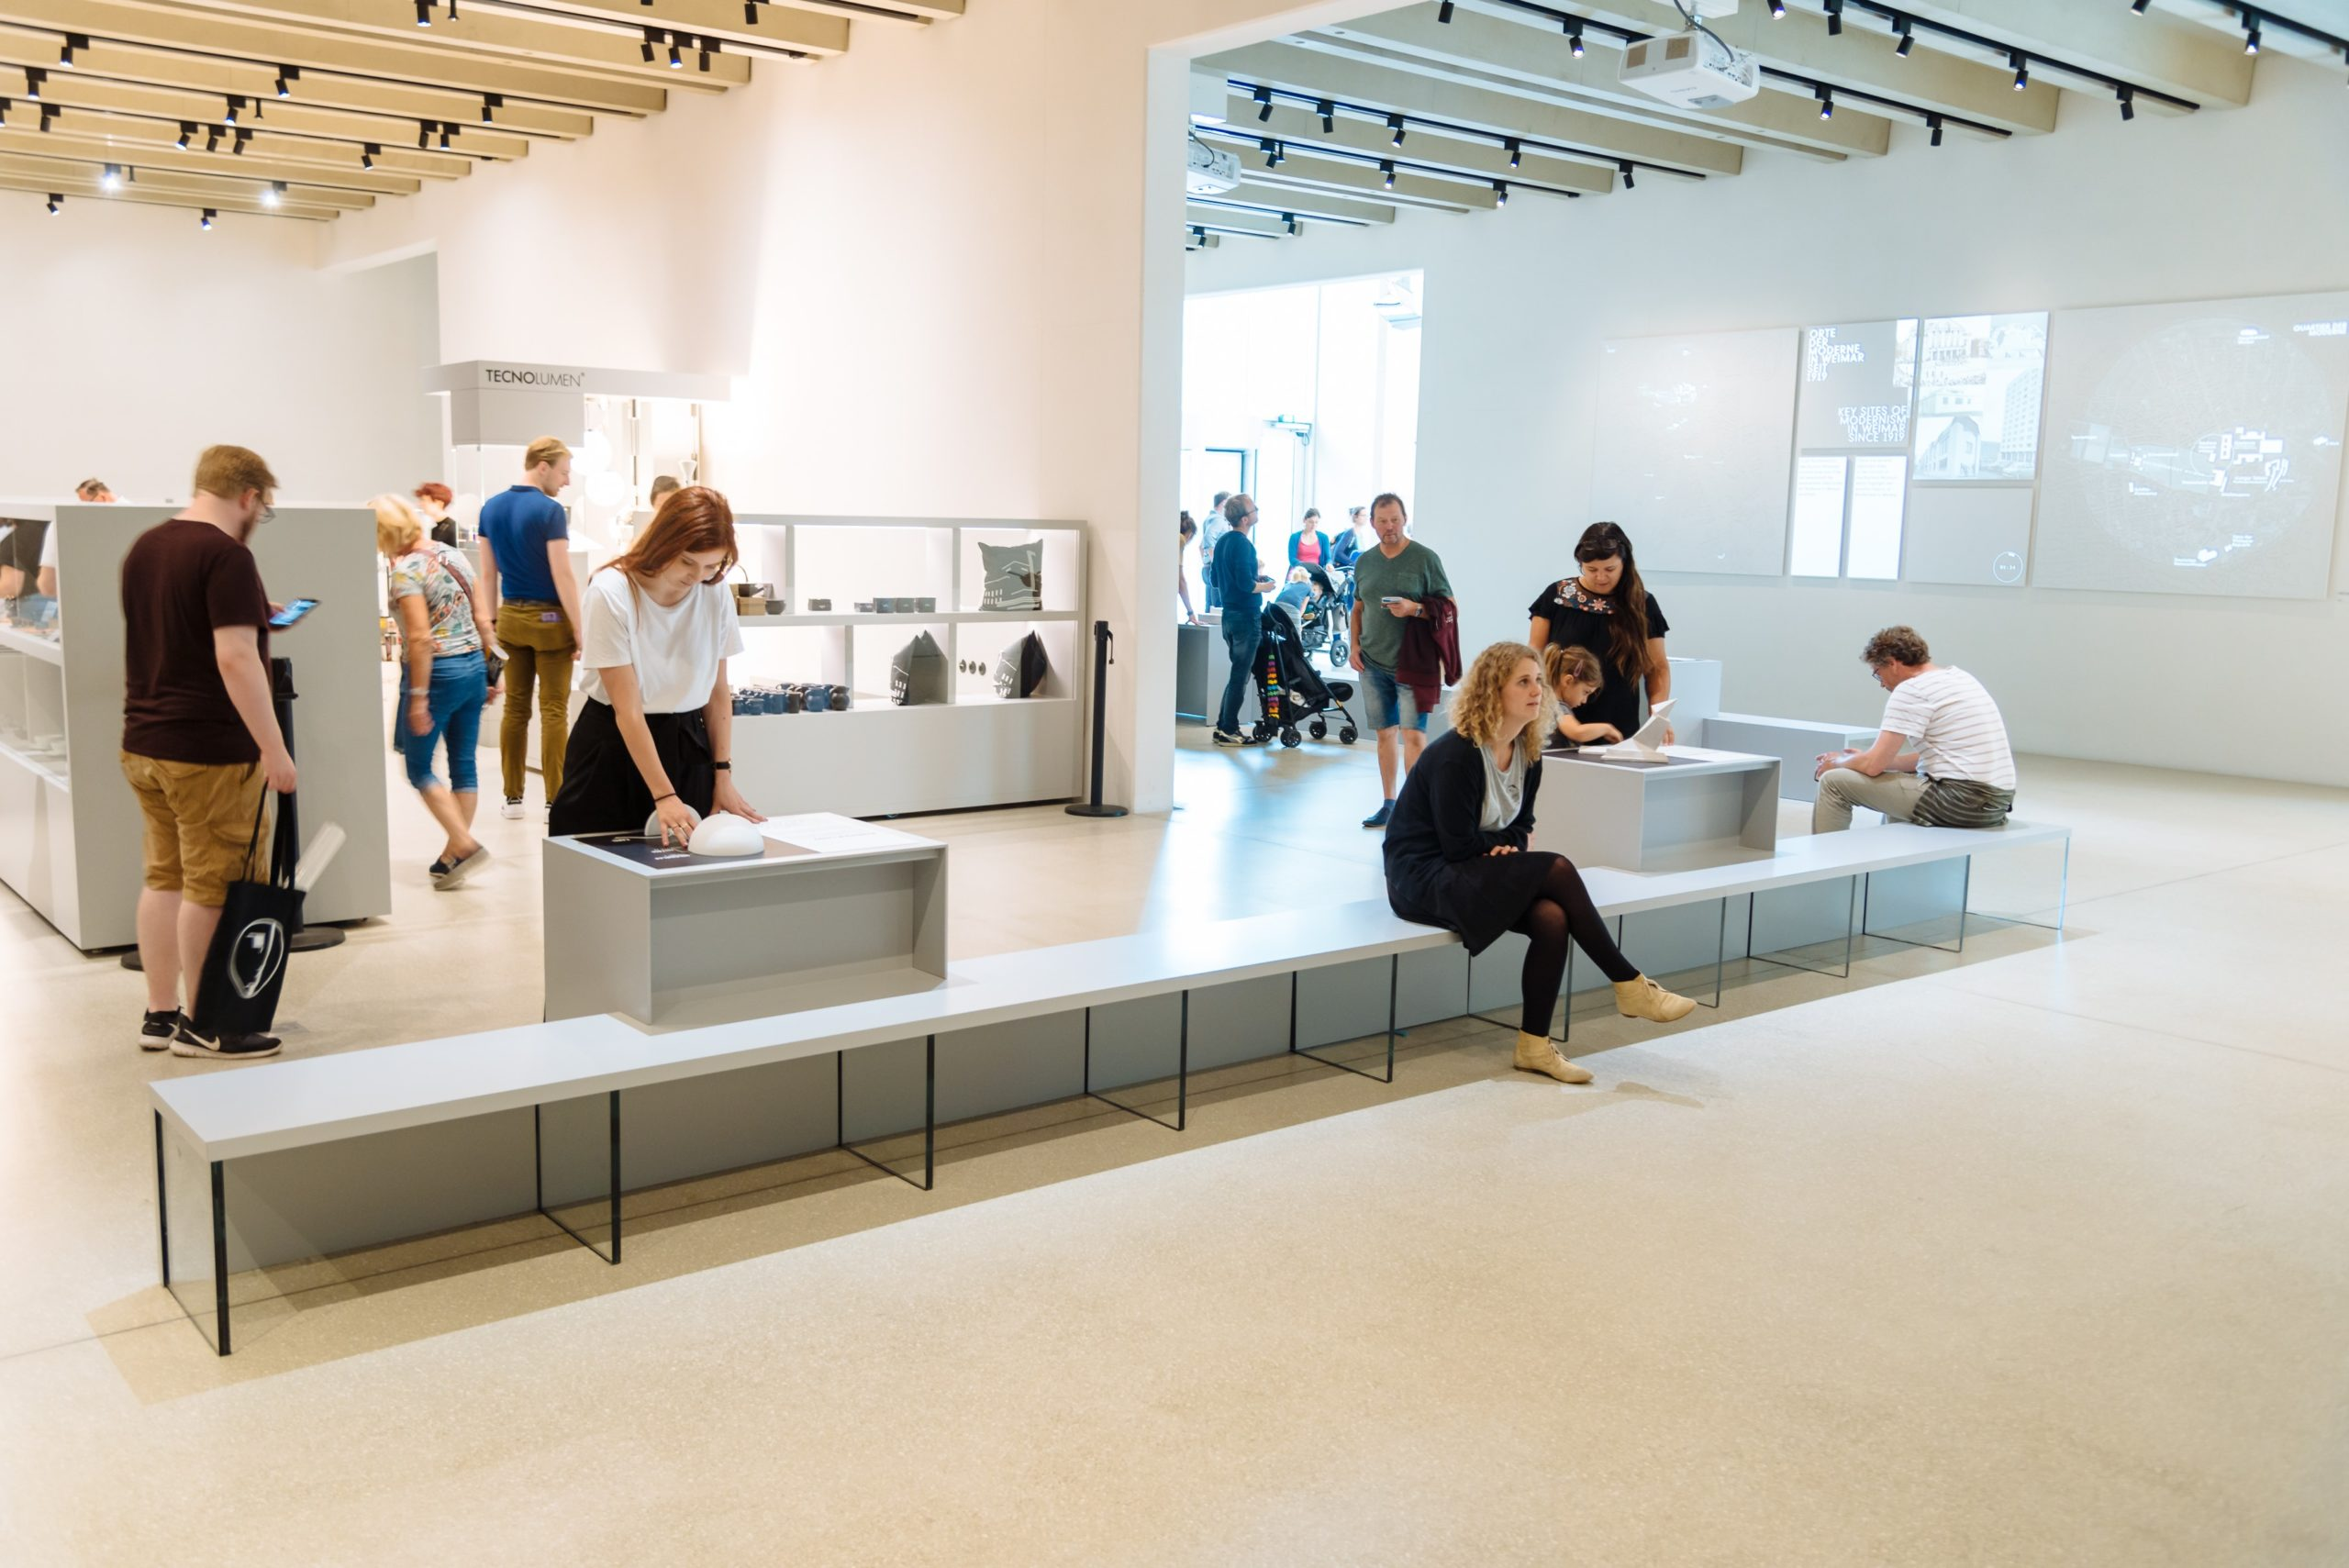 Bauhaus Museum, Weimar